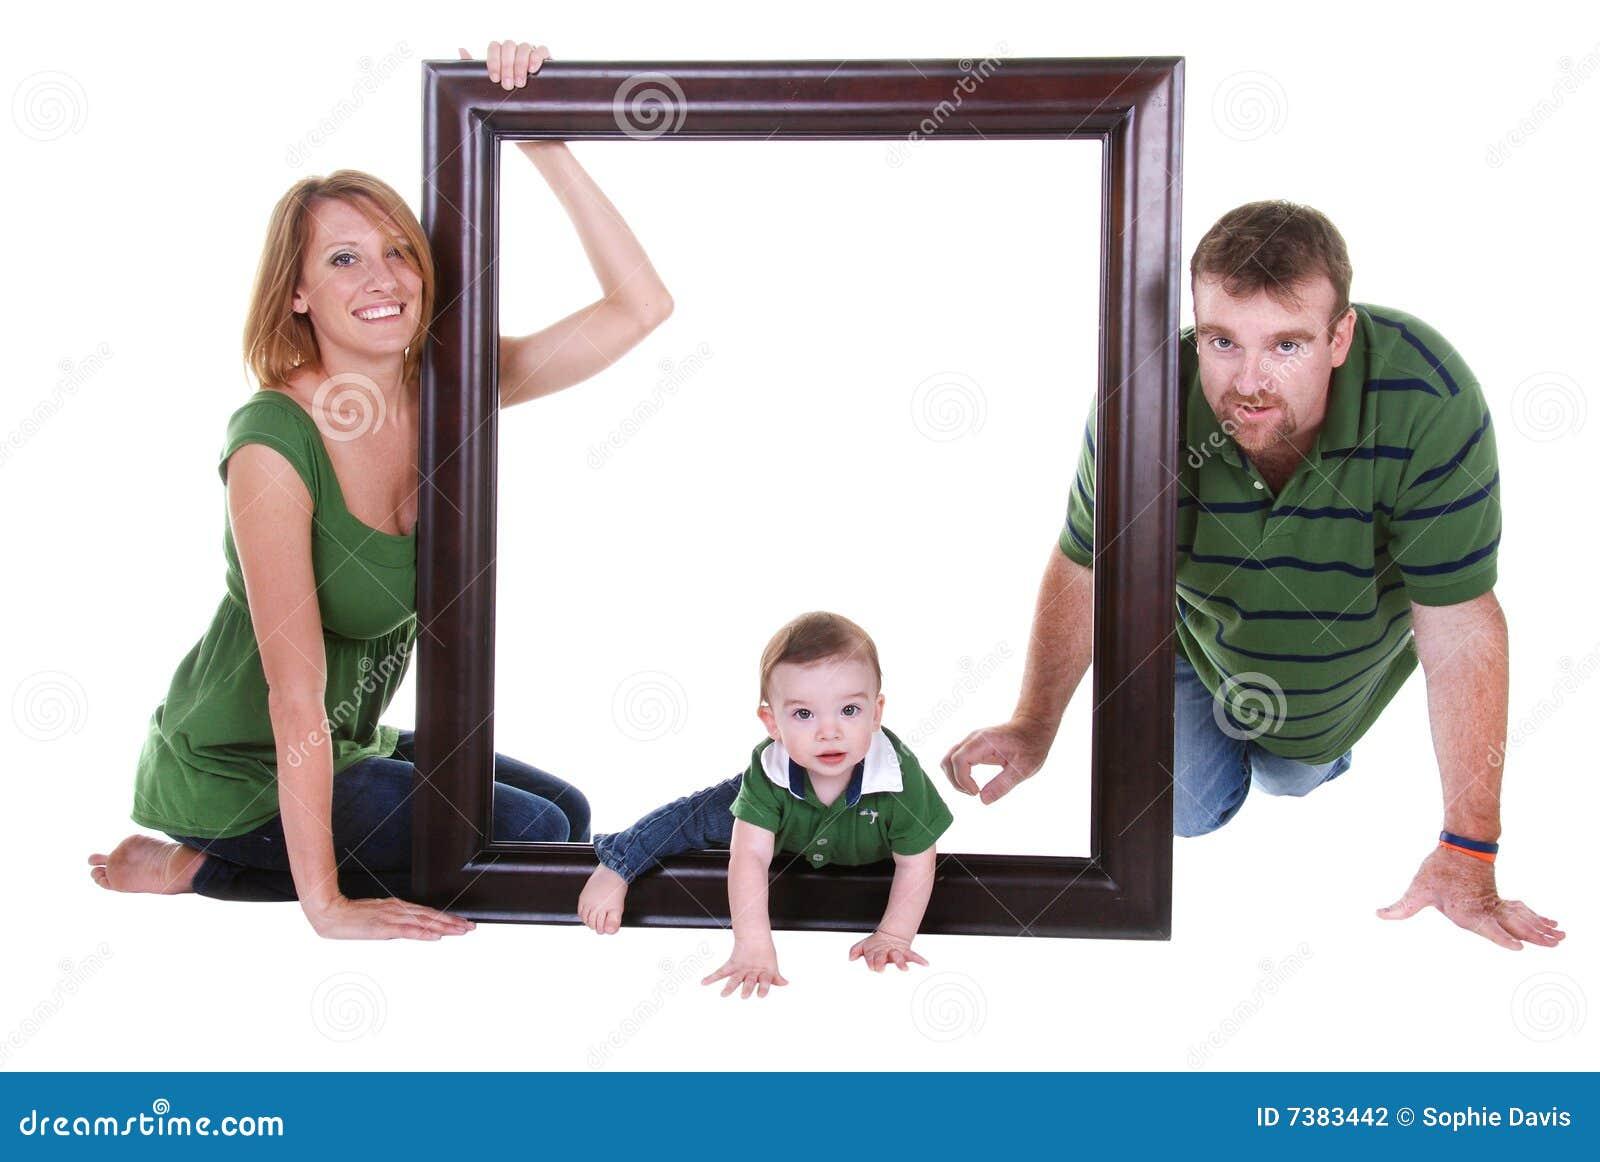 Familjbild